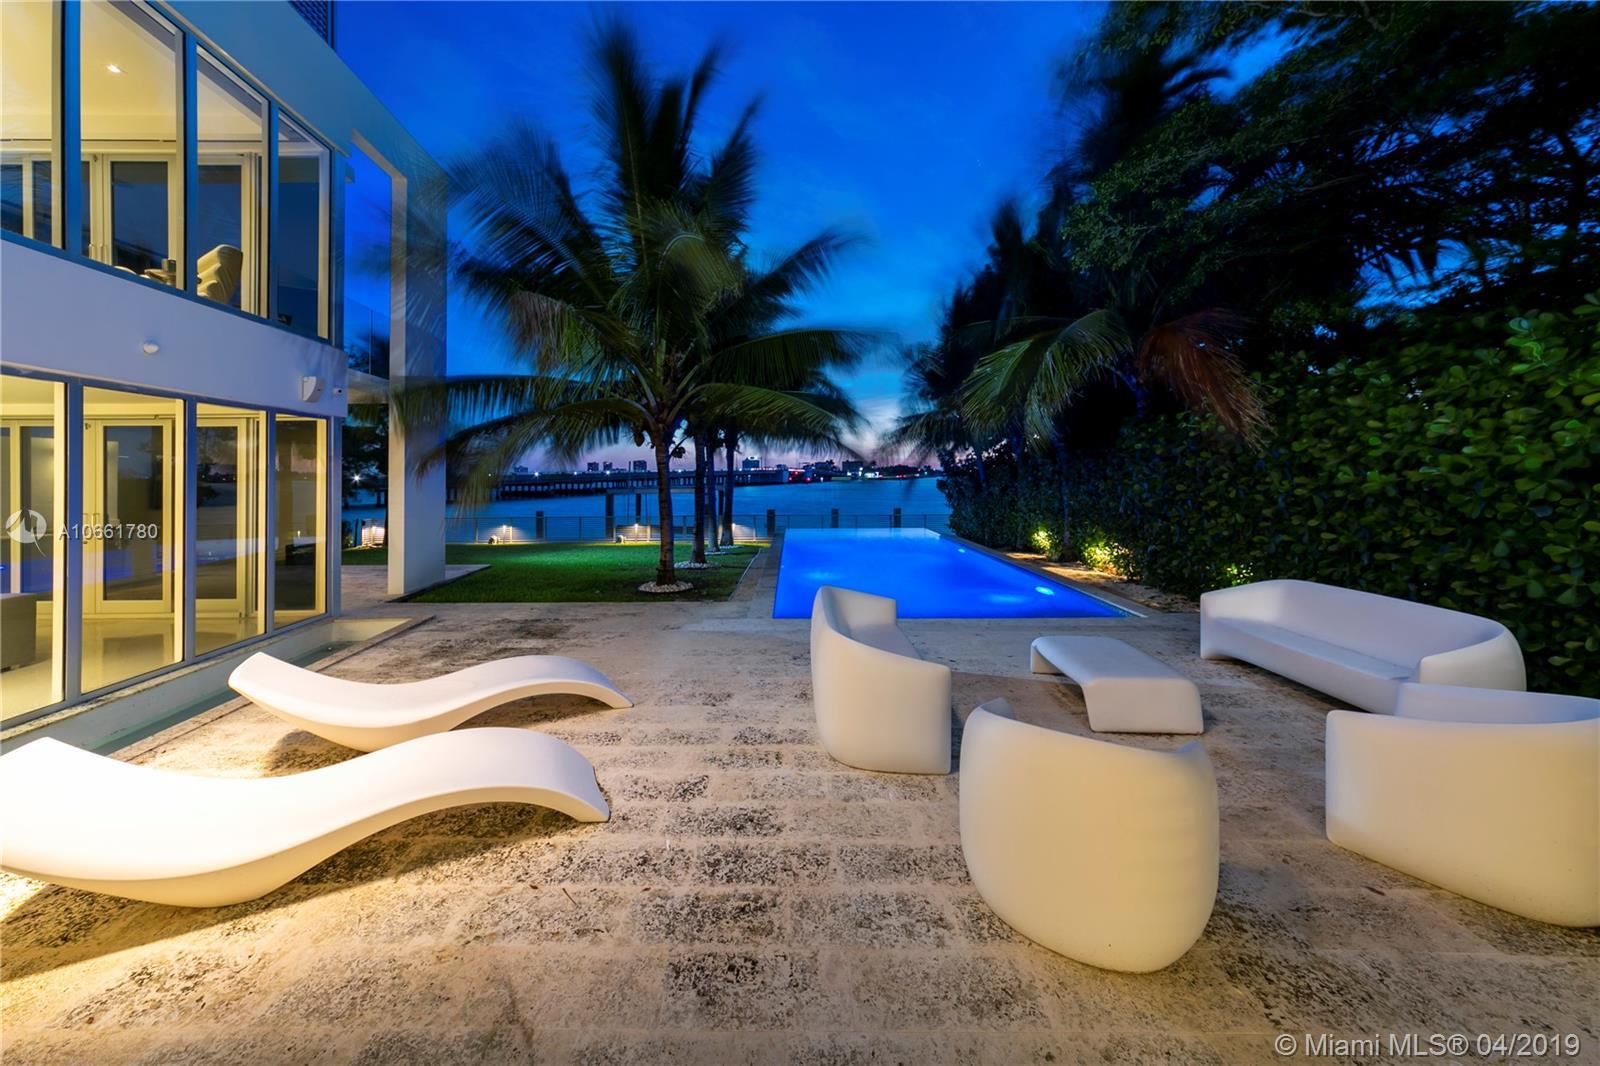 9710 W Broadview Dr, Bay Harbor Islands, FL 33154 - Bay Harbor Islands, FL real estate listing